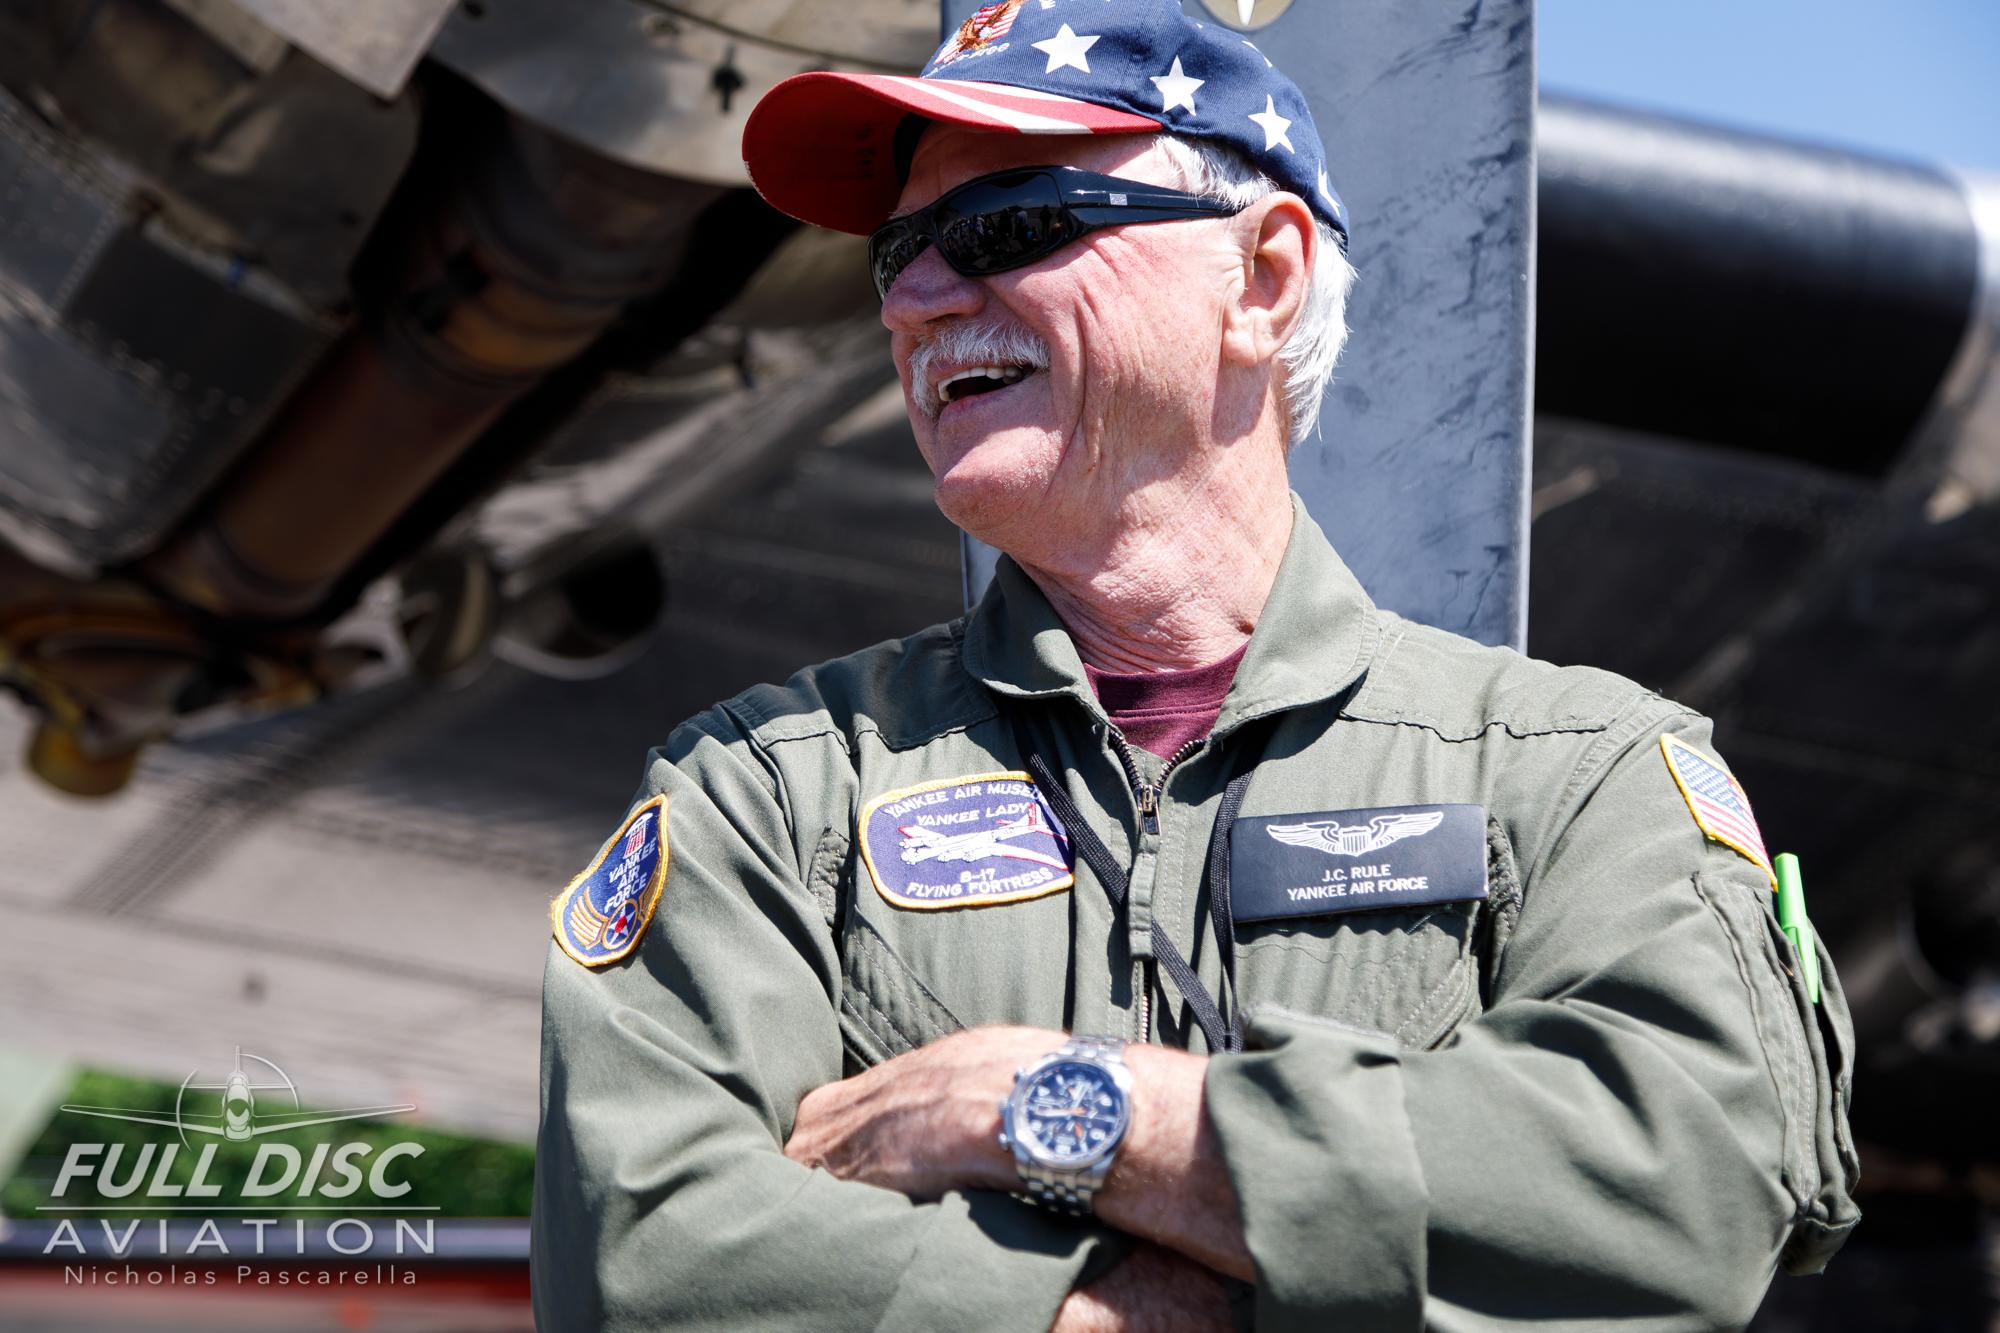 americanairpowermuseum_nicholaspascarella_nickpascarella_fulldiscaviation_legendsofairpower2019_aviation_warbird_johnrule_b17pilot.jpg